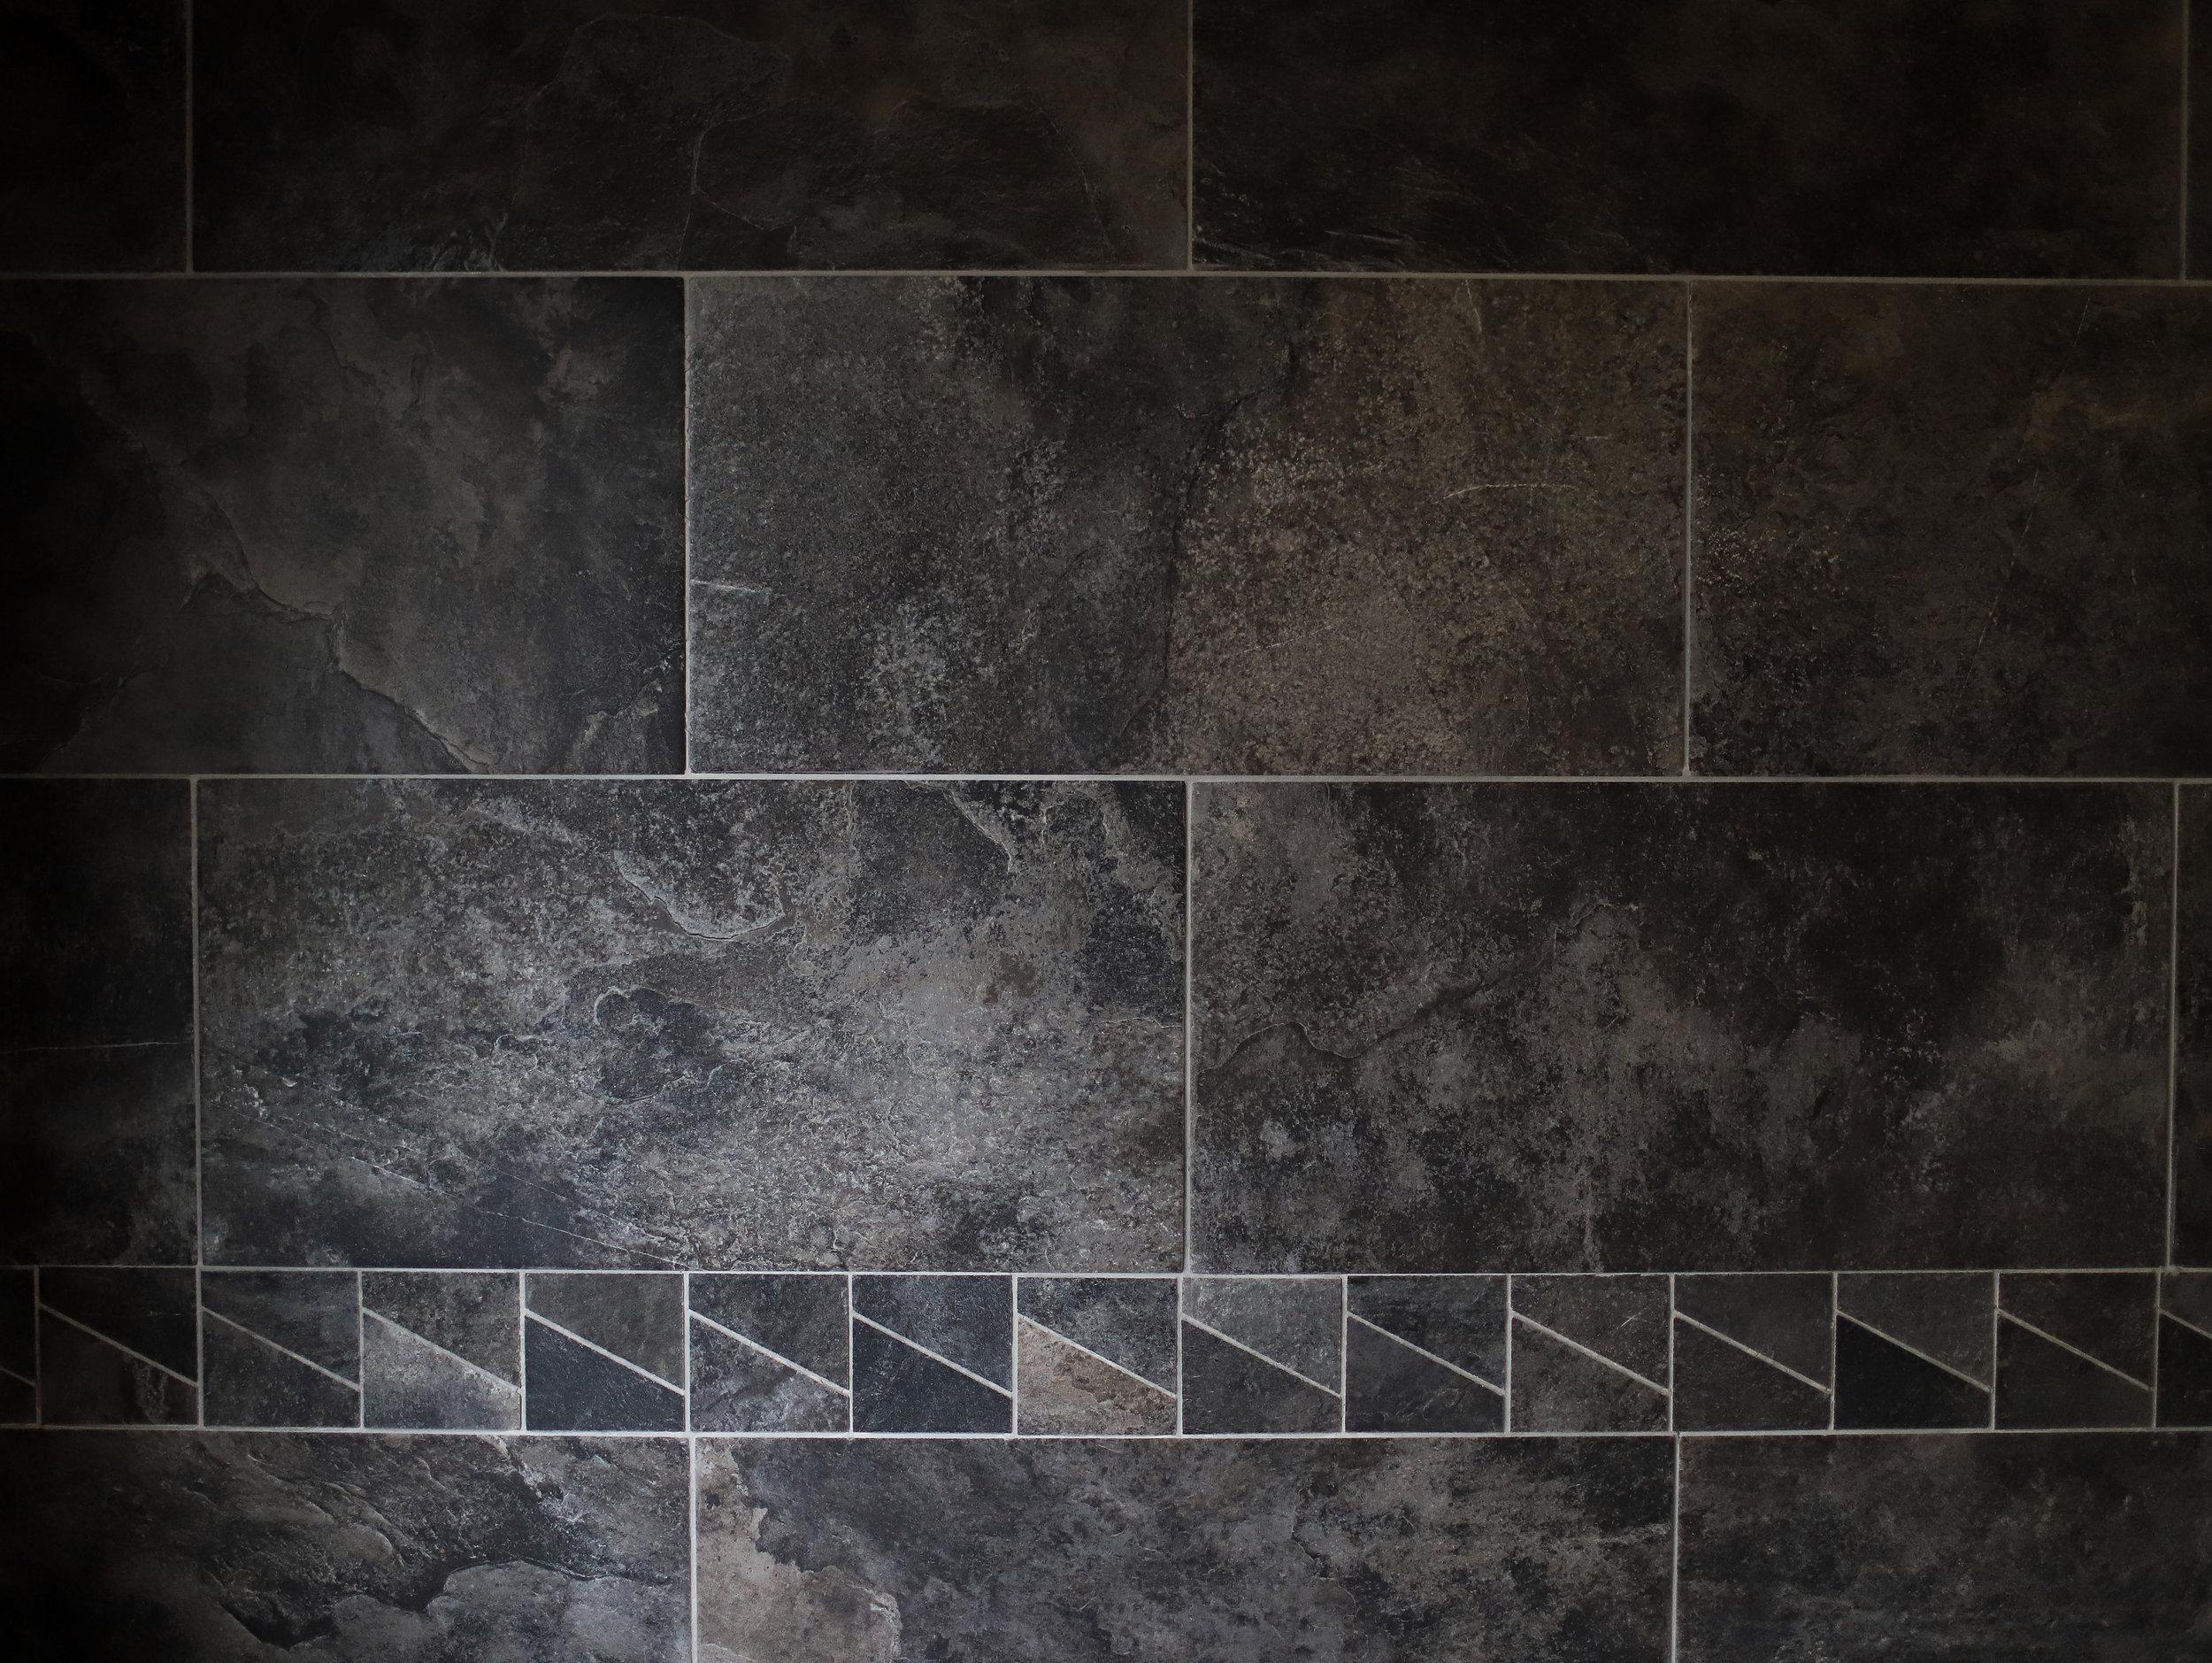 Staunton Tiles Topps Tiles, The Find Interiors